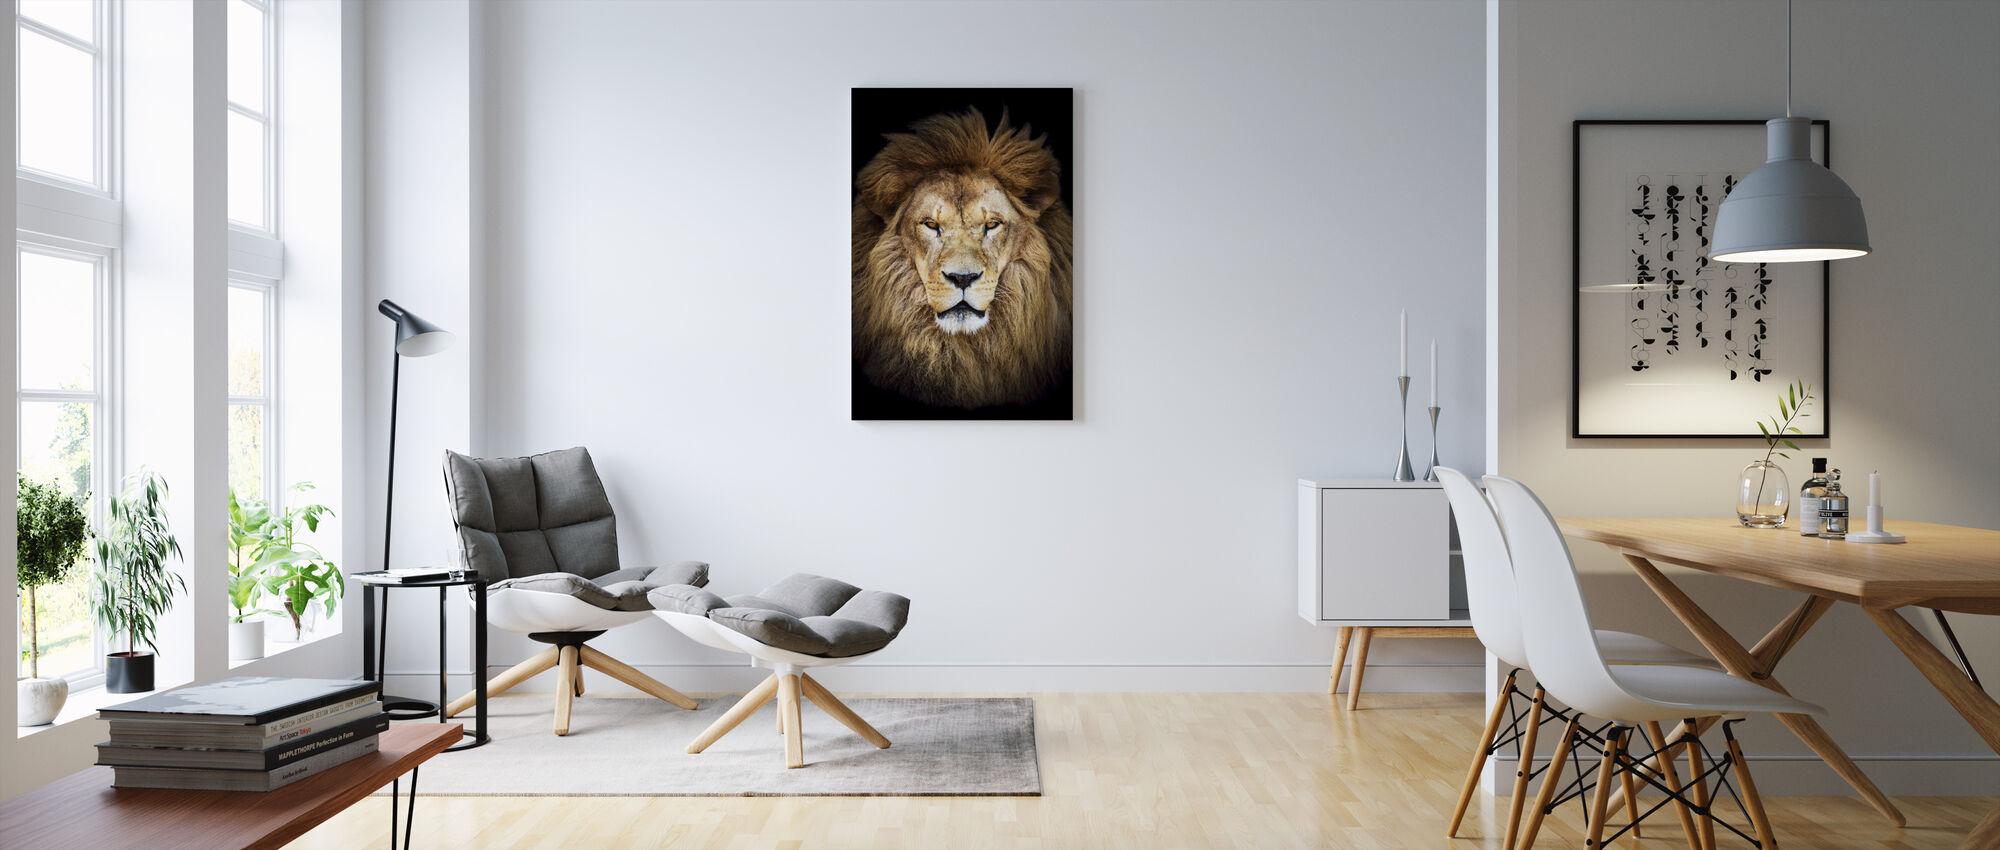 Majestic Lion - Canvas print - Living Room